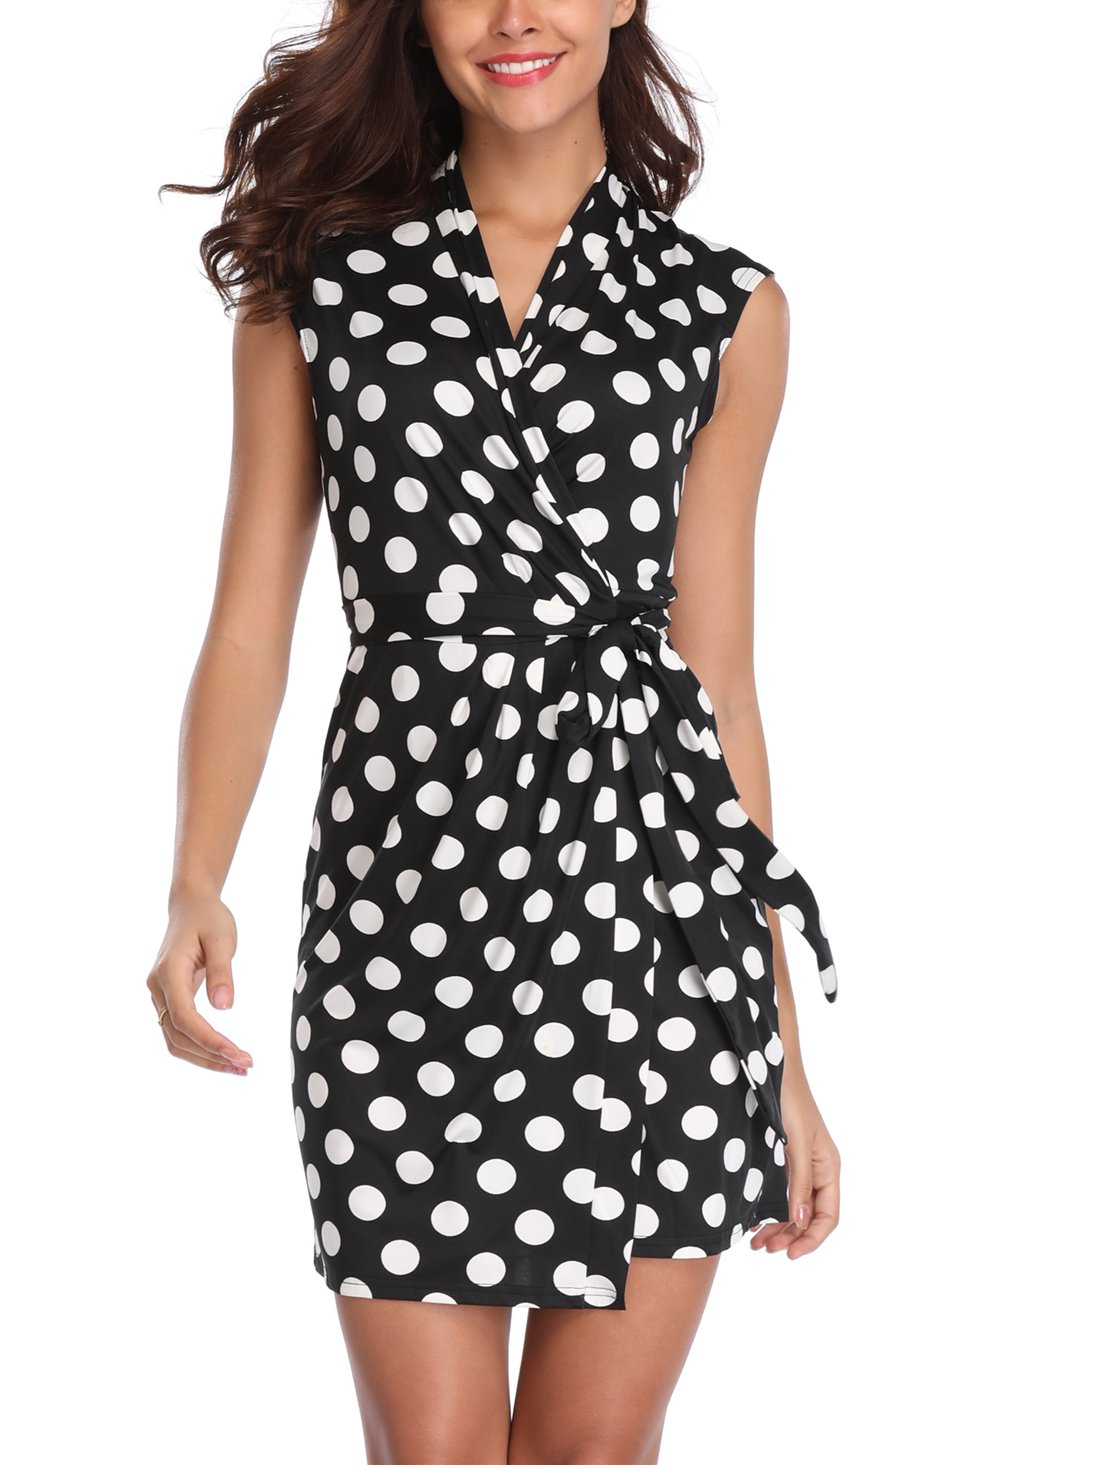 MISS MOLY Women's Knee Length V Neck Sleeveless Tie Waist Polka Dots Casual Romper Jumpsuit Wrap Dress (2 X-Small, Black-White)